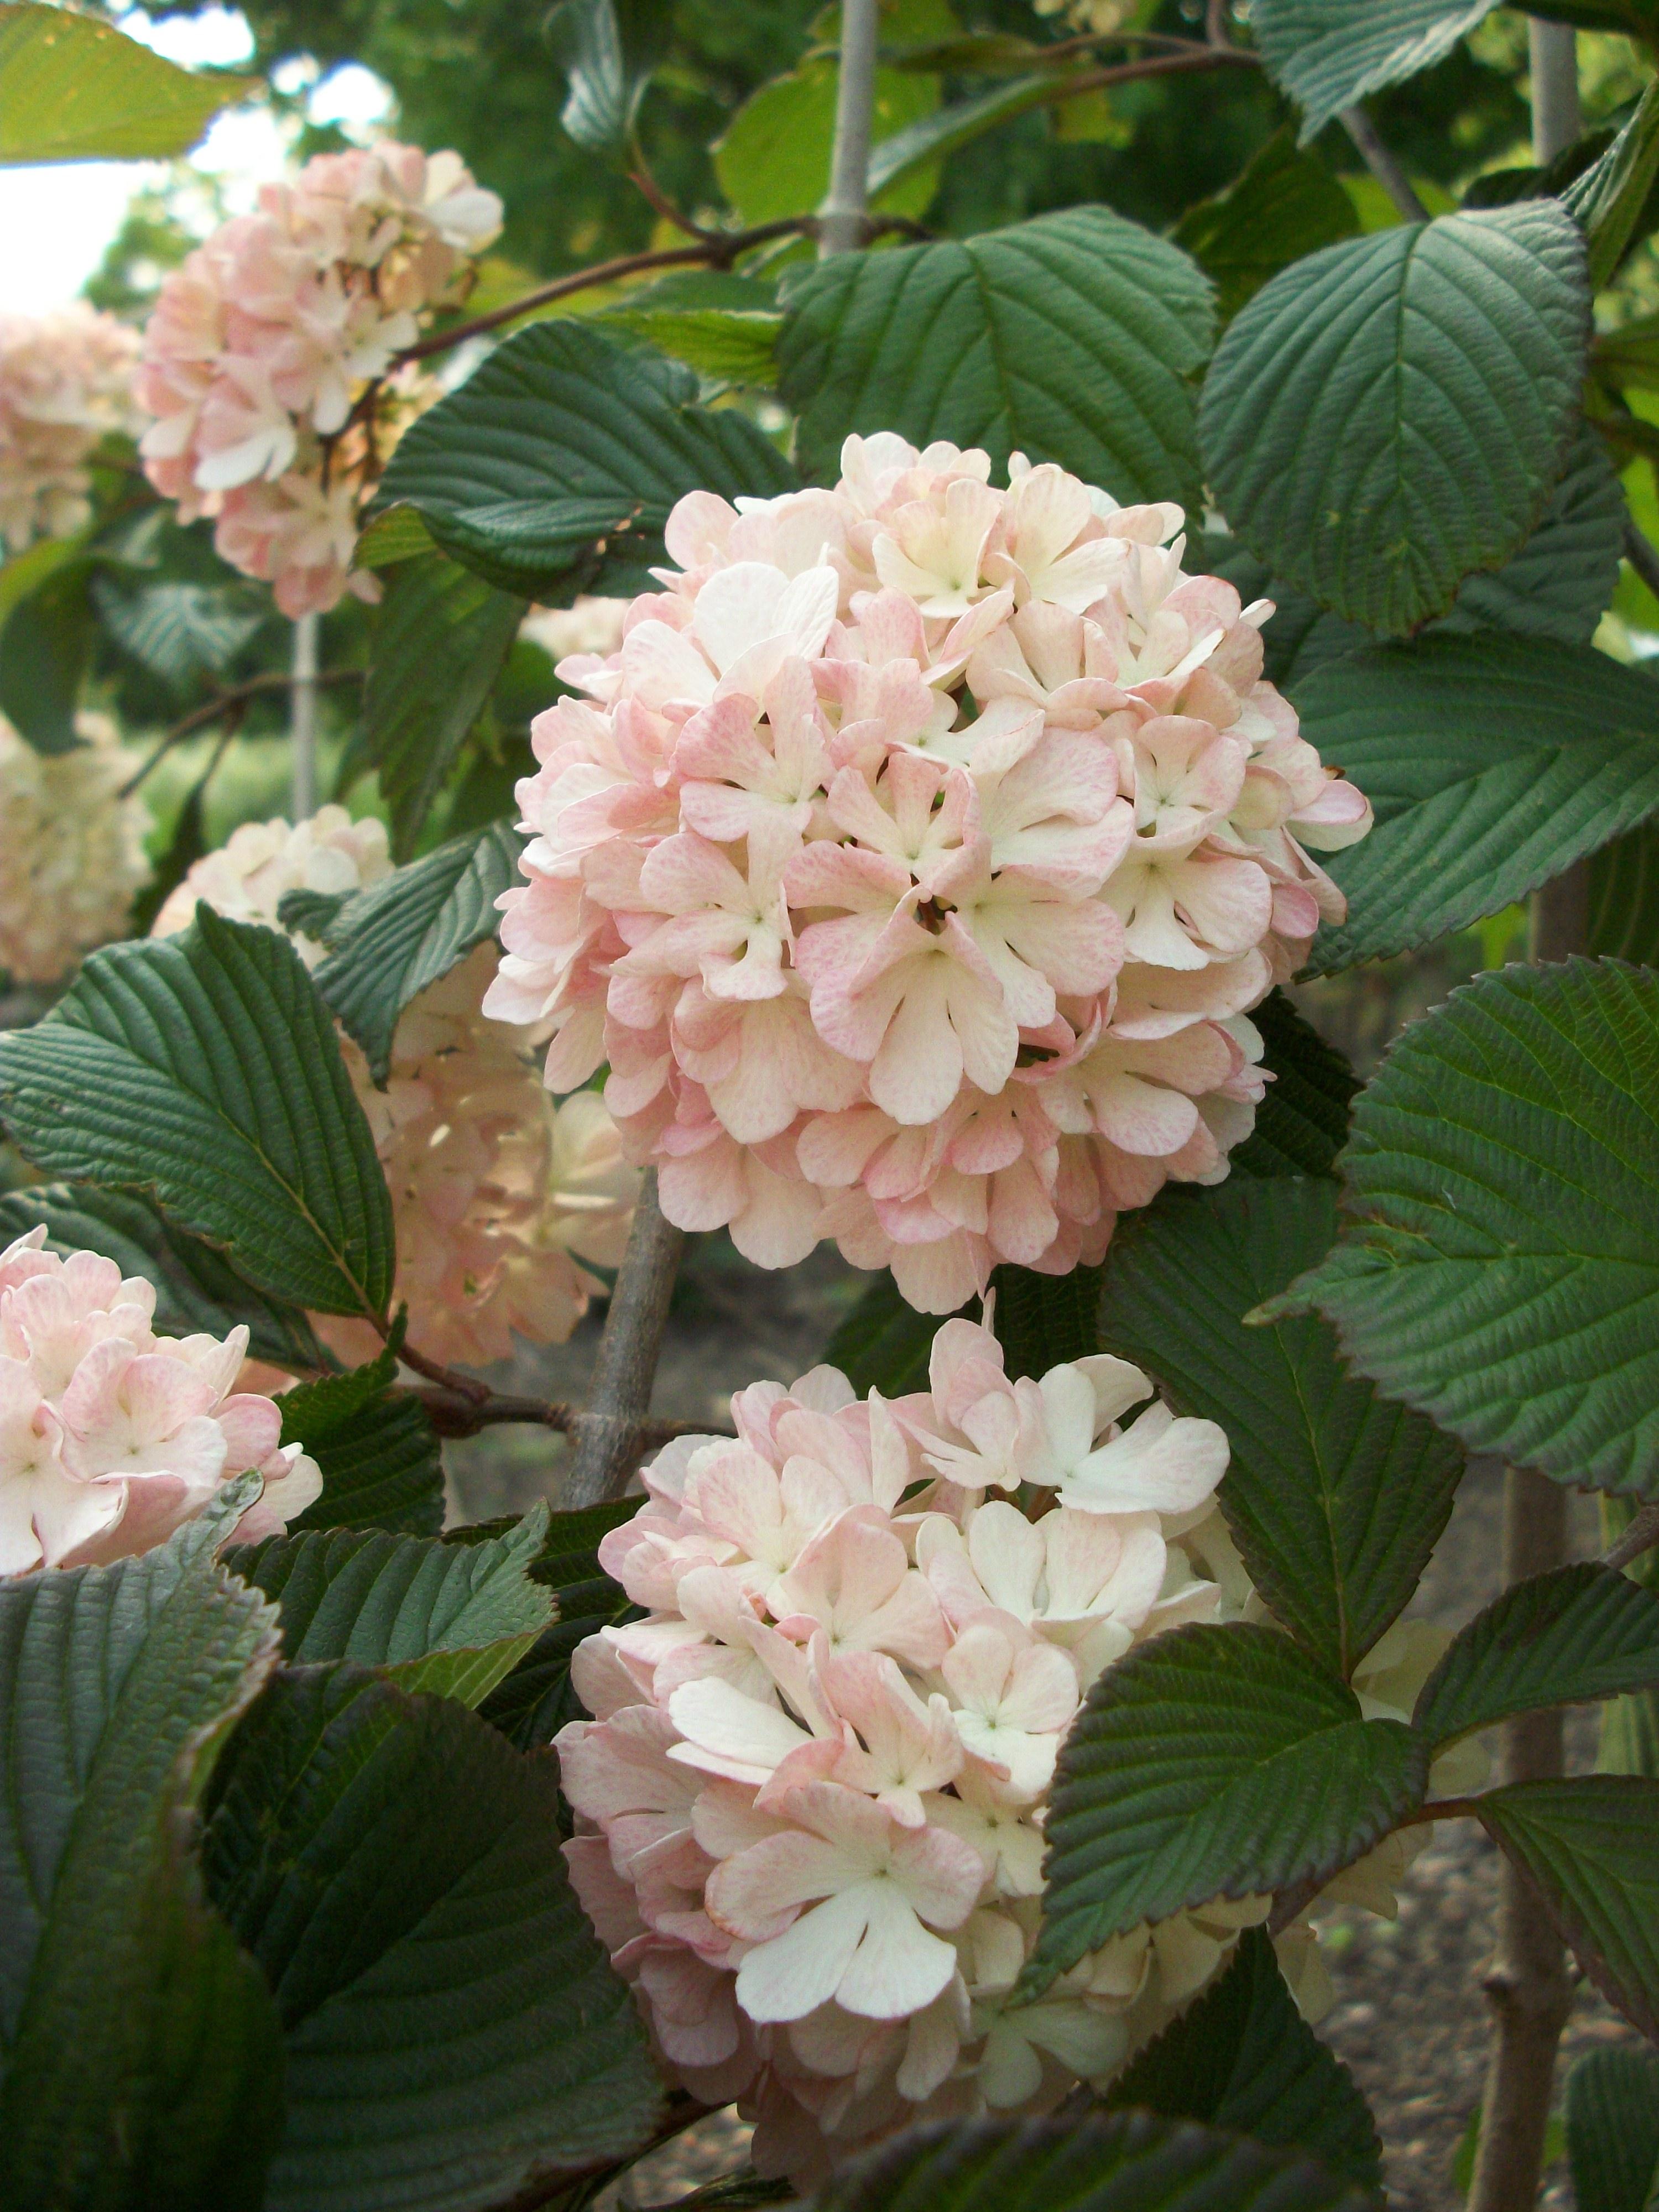 Willoway nurseries inc the midwests premier wholesale grower viburnum pt sprklg pnk champagne mightylinksfo